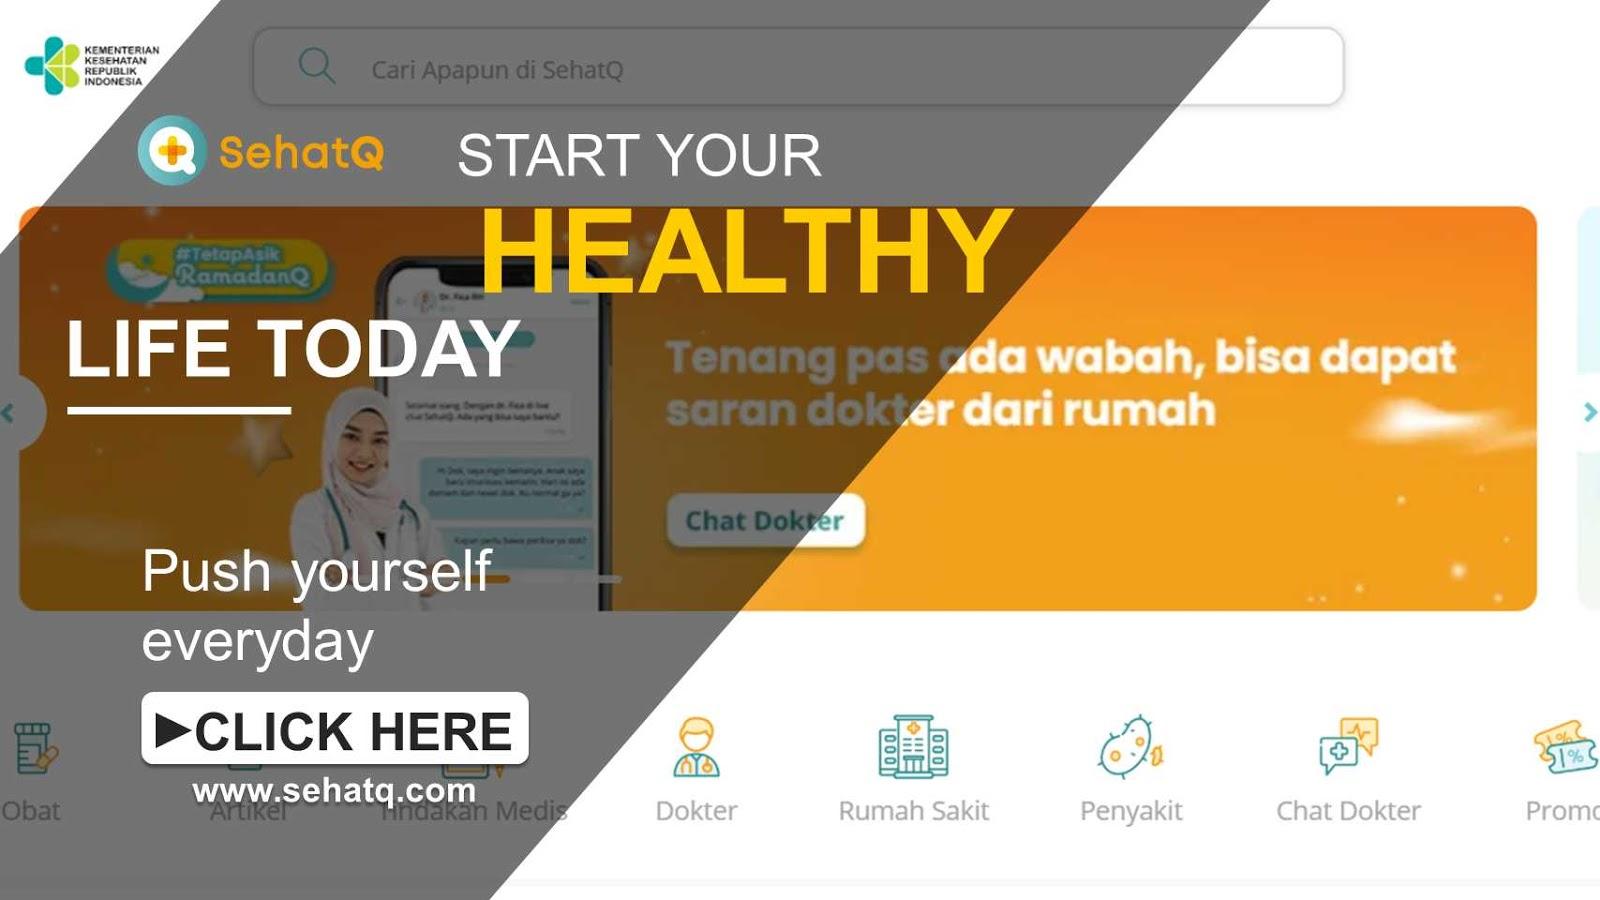 www.sehatq.com